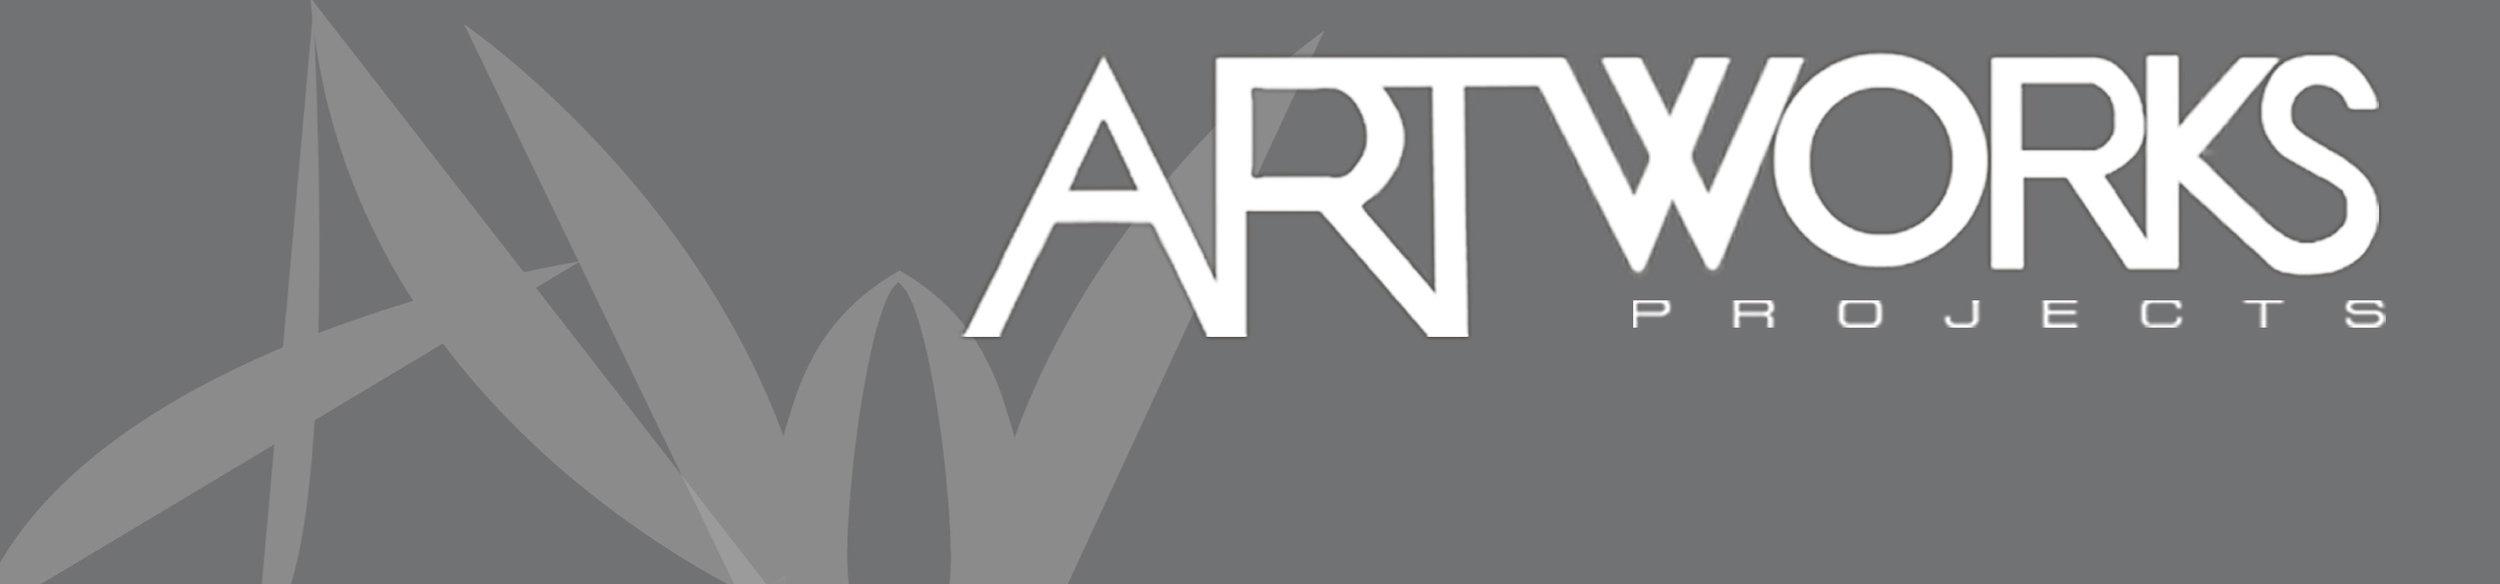 ARTWORKS-website-1st-page_lores.jpg